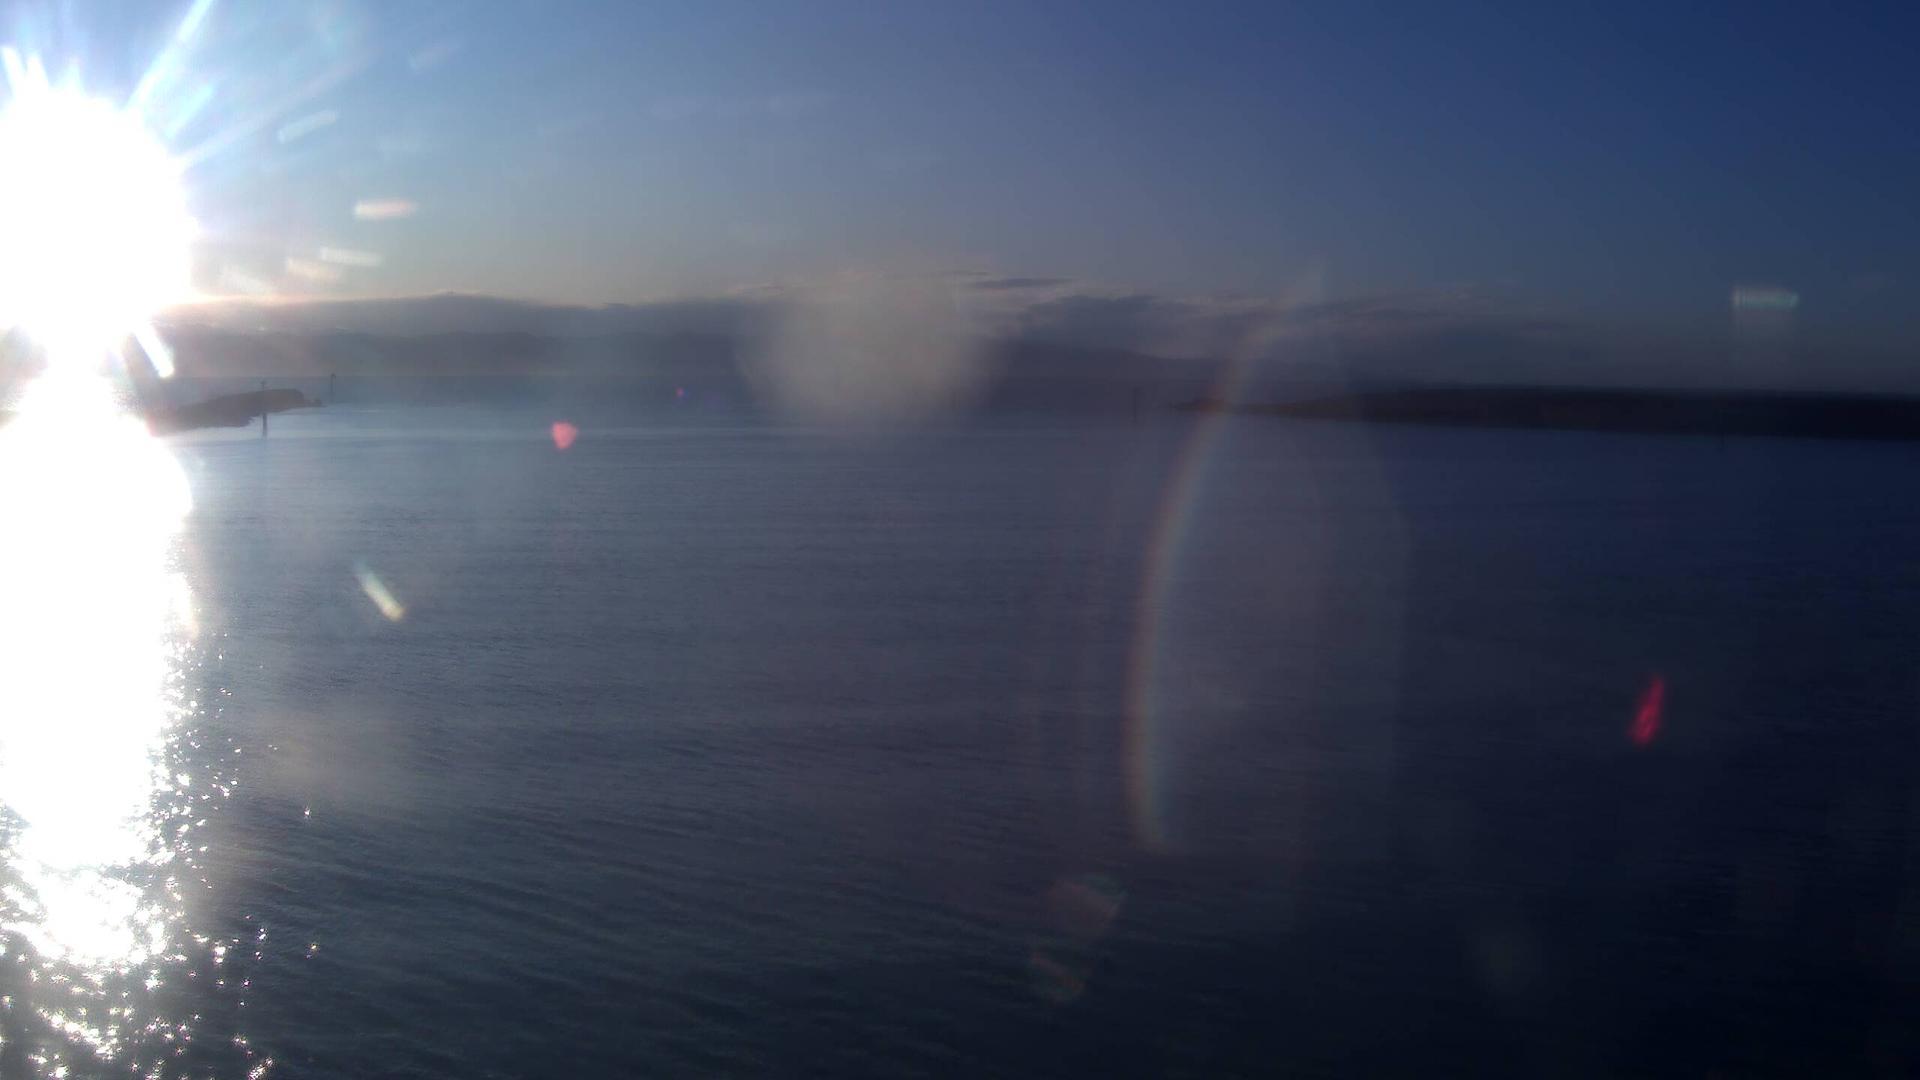 Webkamera Port Nelson › North-West: Port − The cut